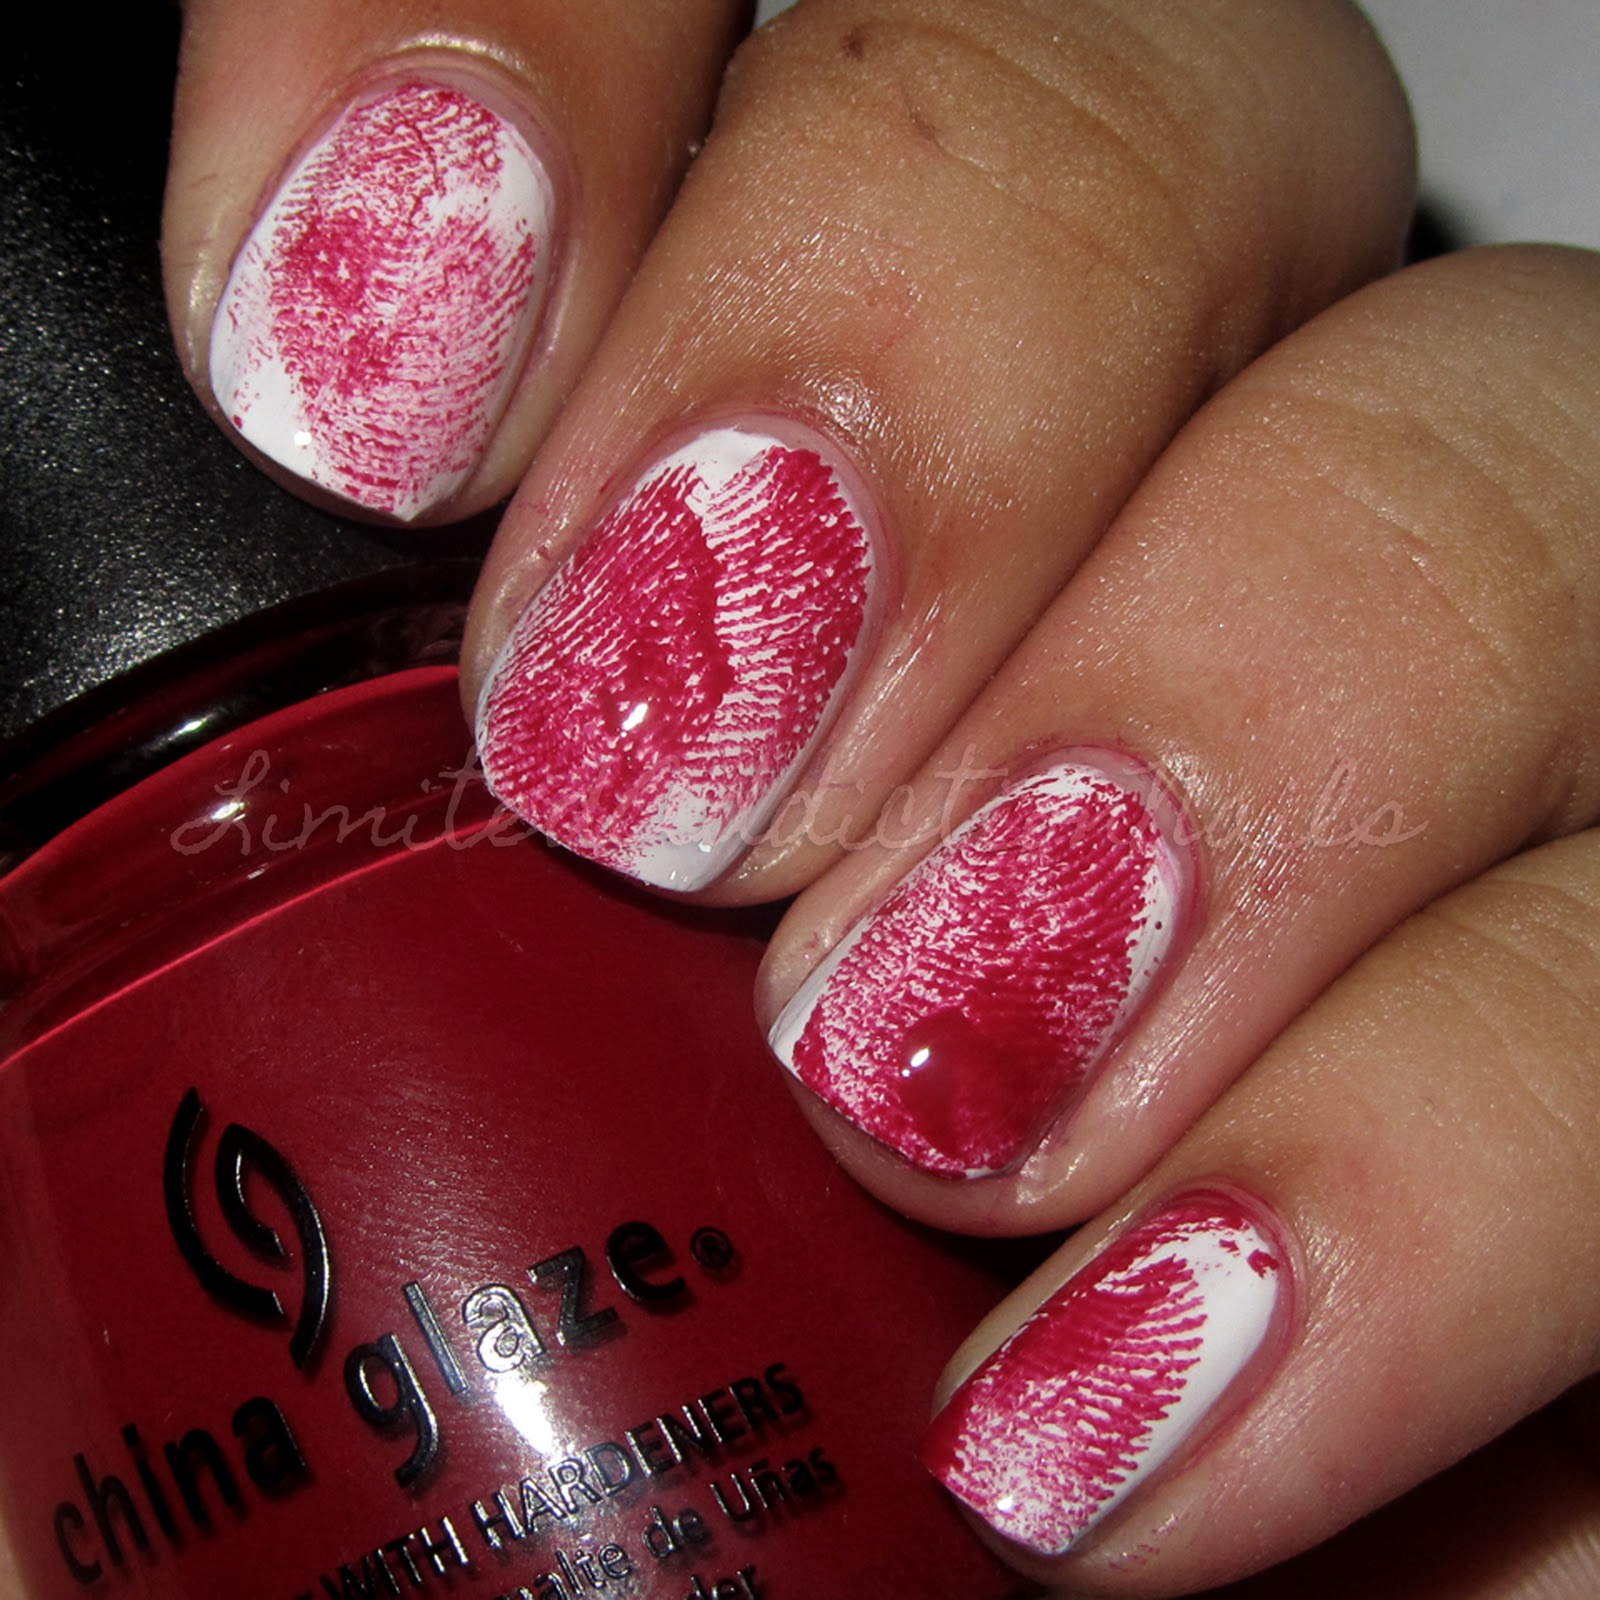 LimitedAddictionNails: Halloween Nails - Bloody Fingerprint